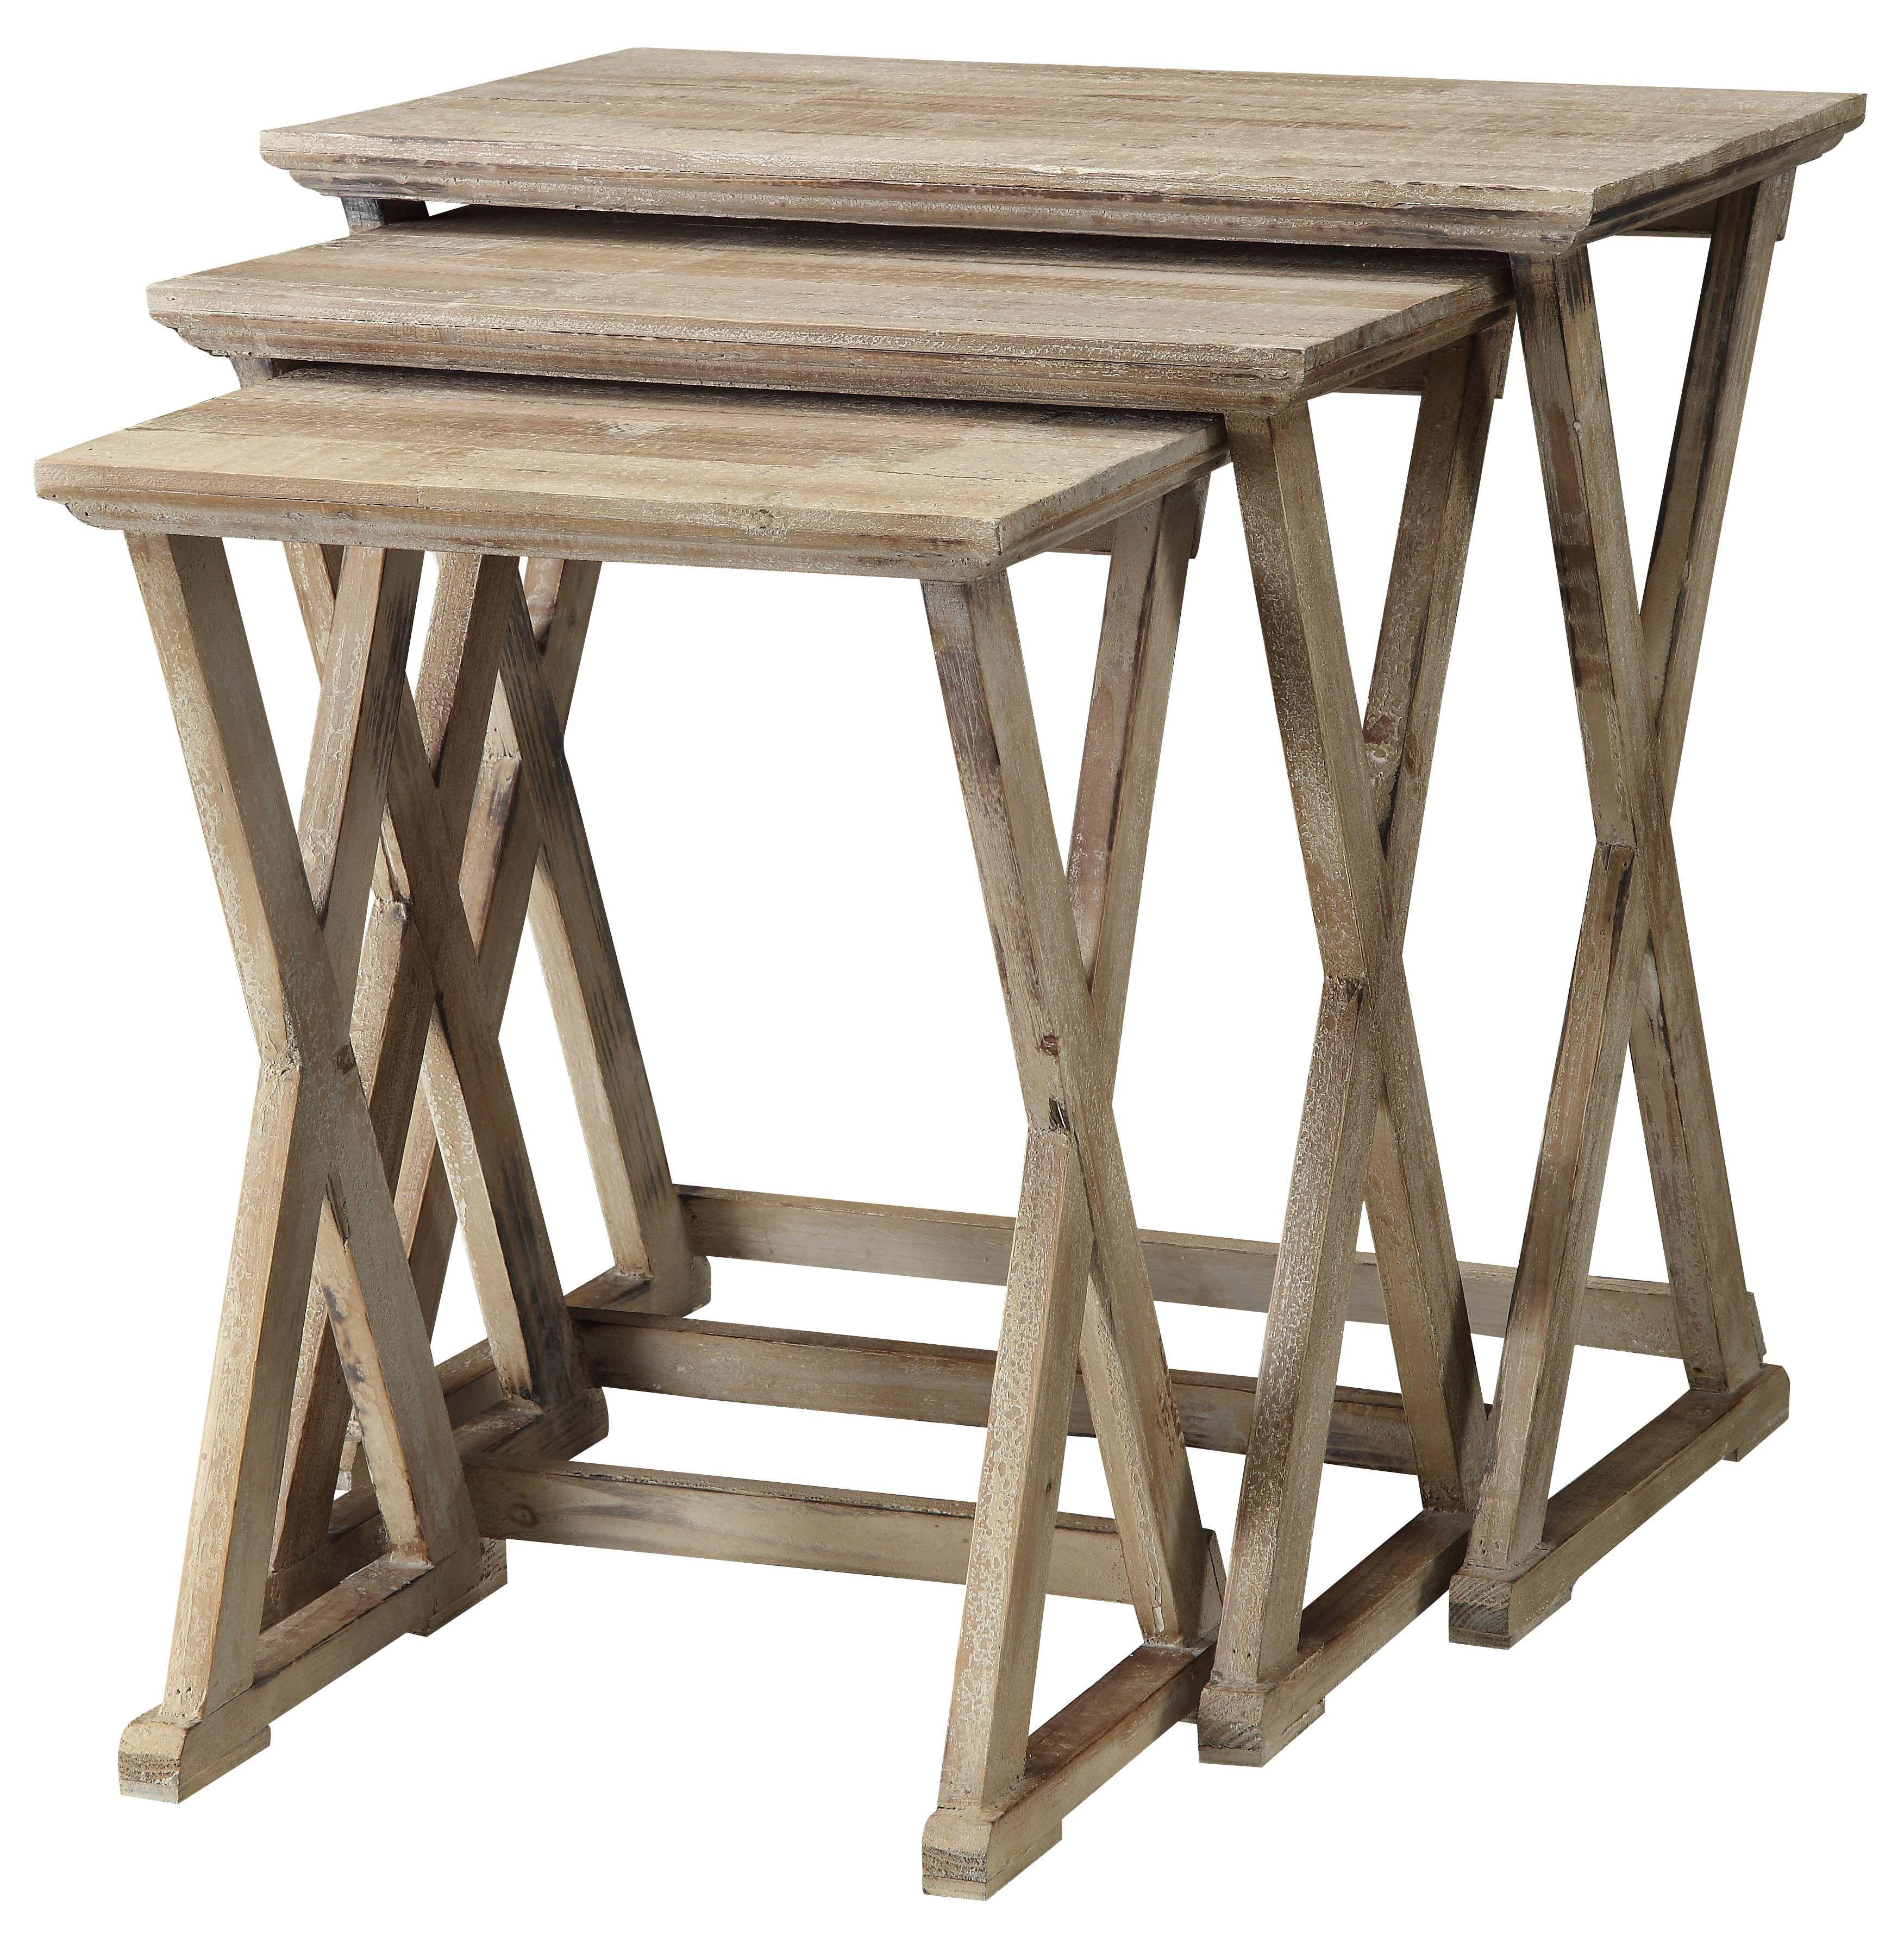 Caledon Nesting Tables Nesting Tables Metal Nesting Tables Wood Nesting Tables [ 3576 x 3504 Pixel ]